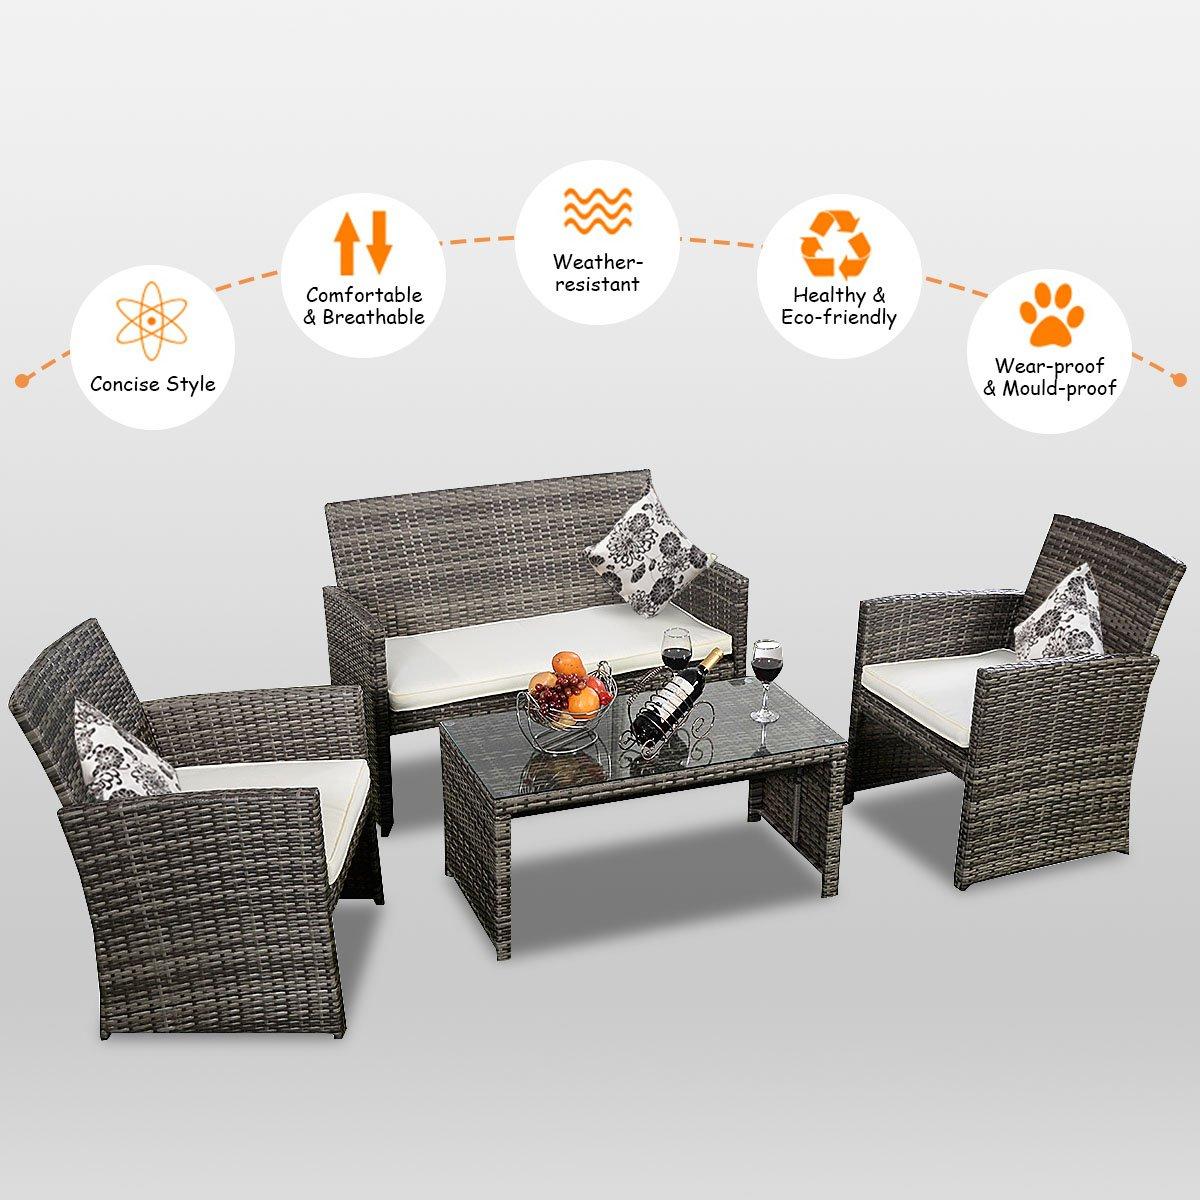 Goplus 4 PC Rattan Patio Furniture Set Garden Lawn Sofa Cushioned Seat Wicker Sofa (Mix Gray) by Goplus (Image #4)